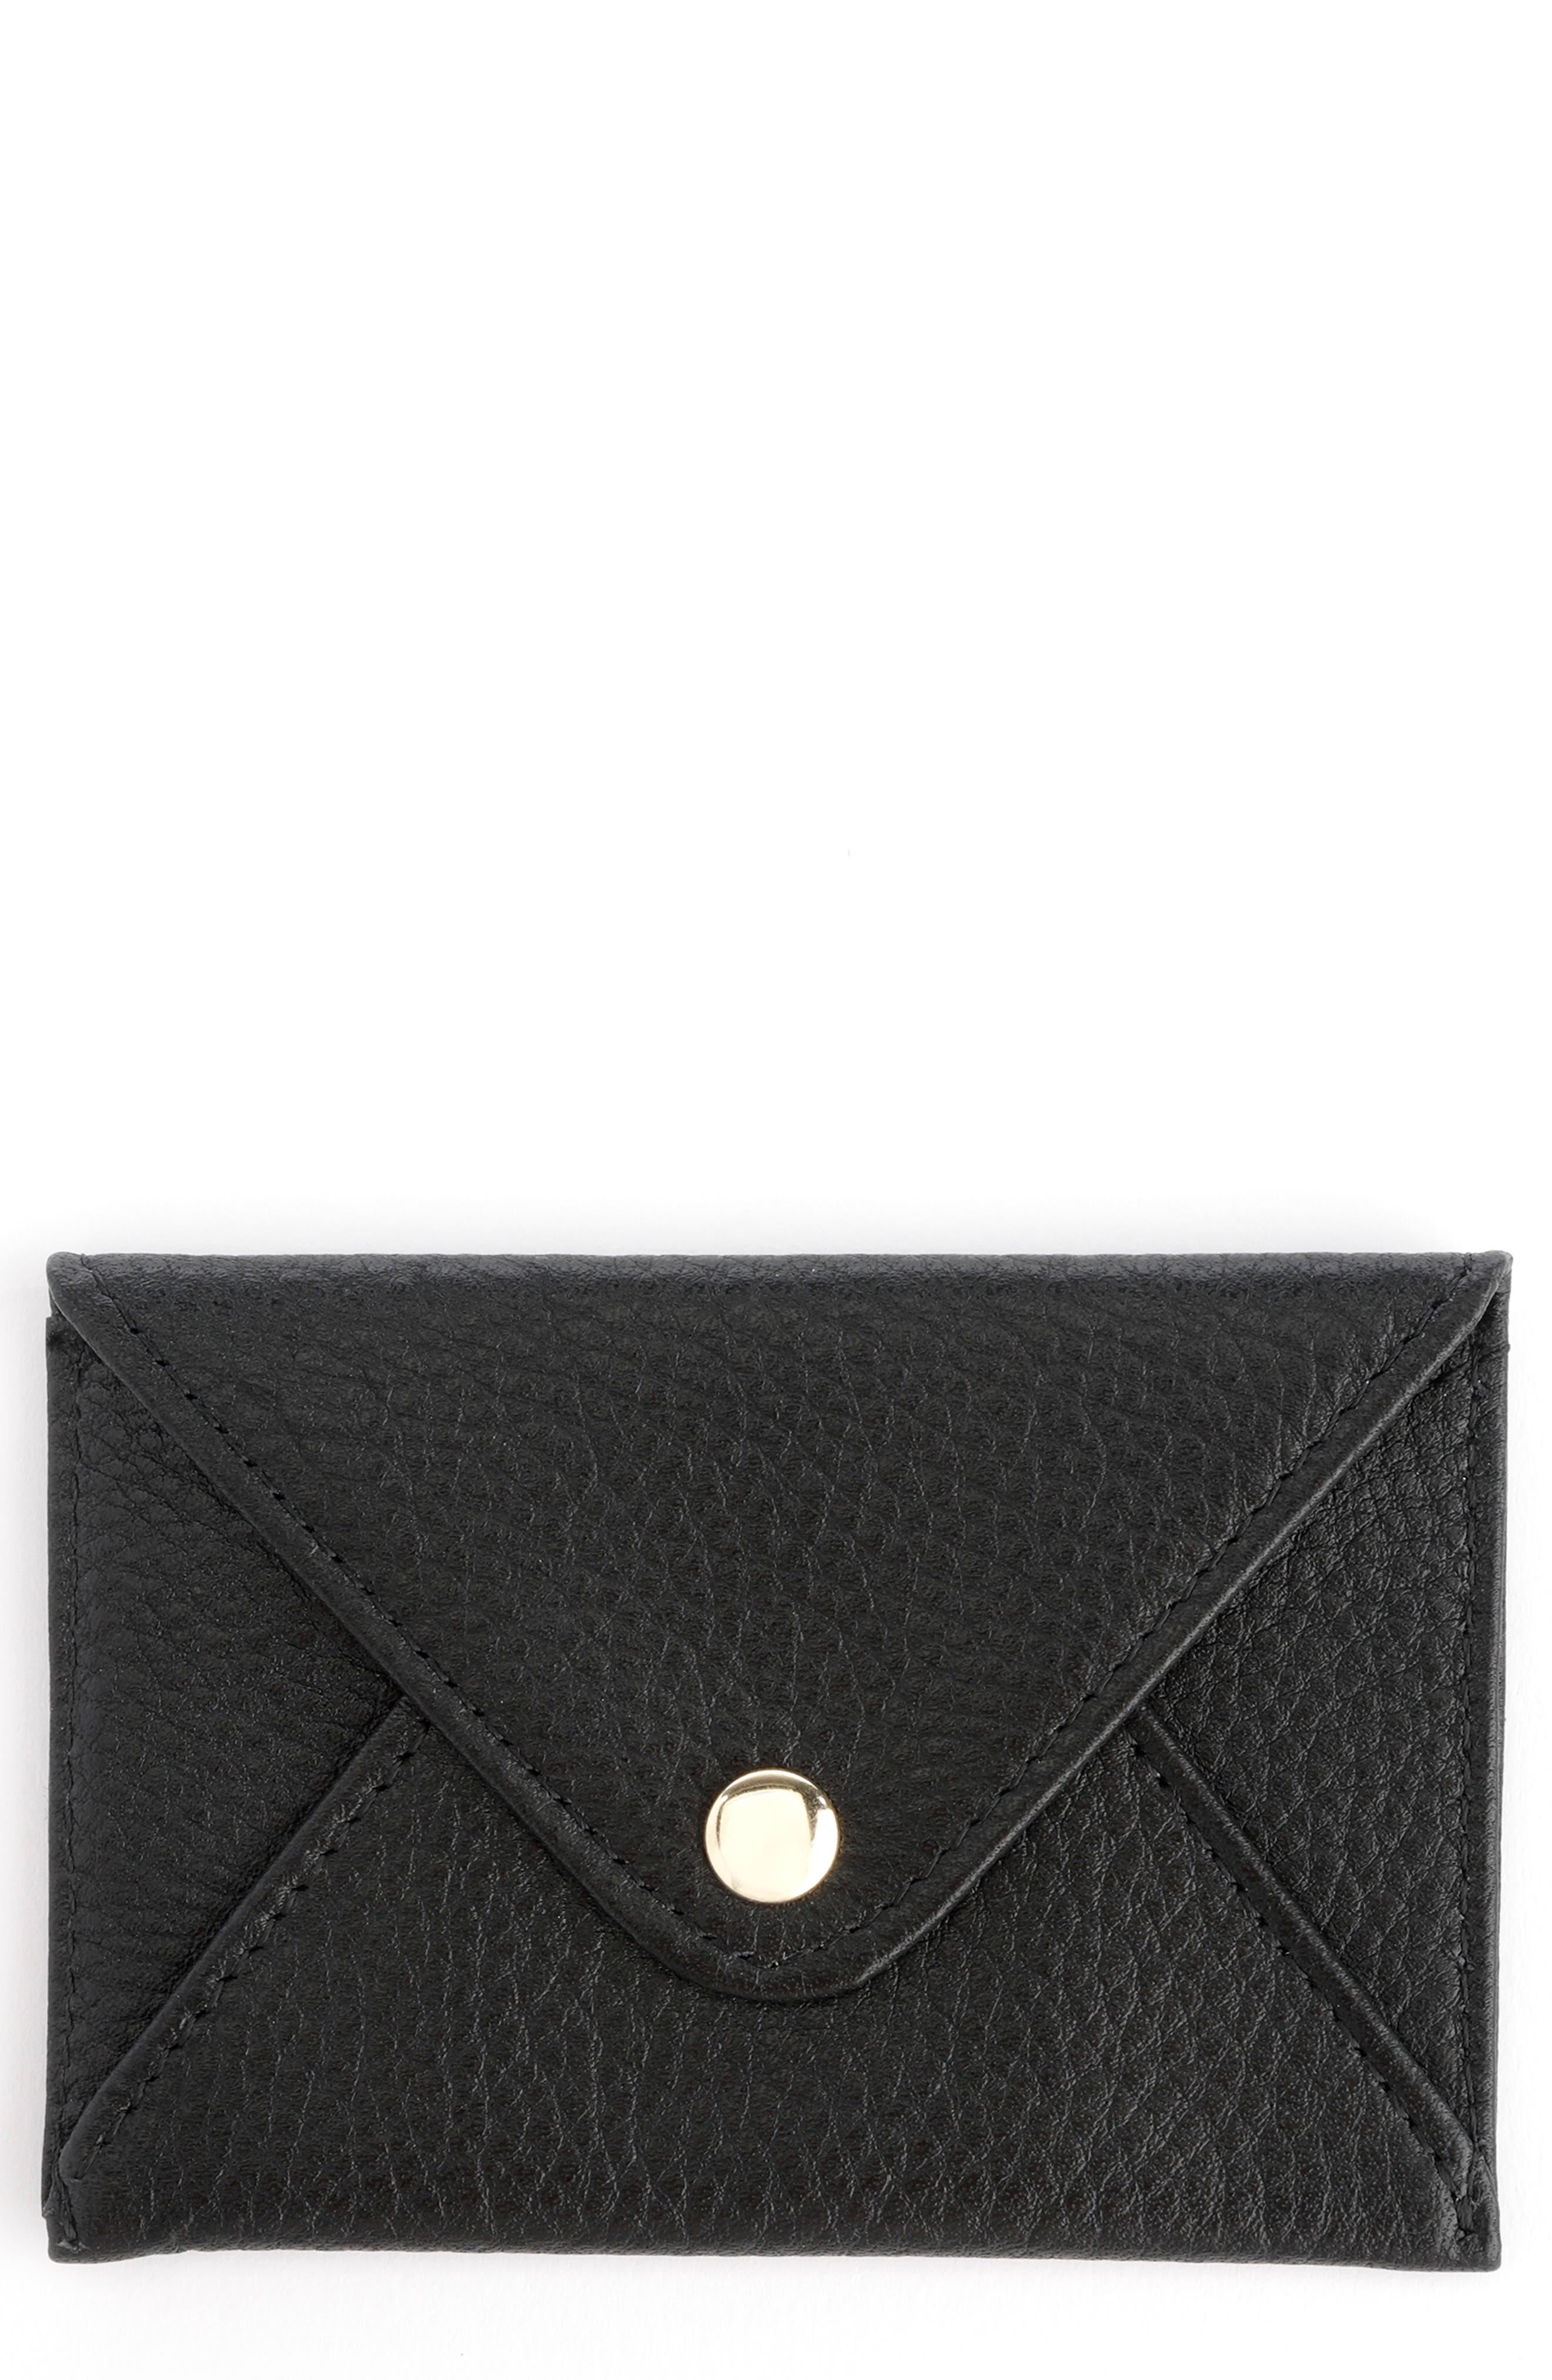 ROYCE Women's Royce Leather Envelope Card Holder - Black